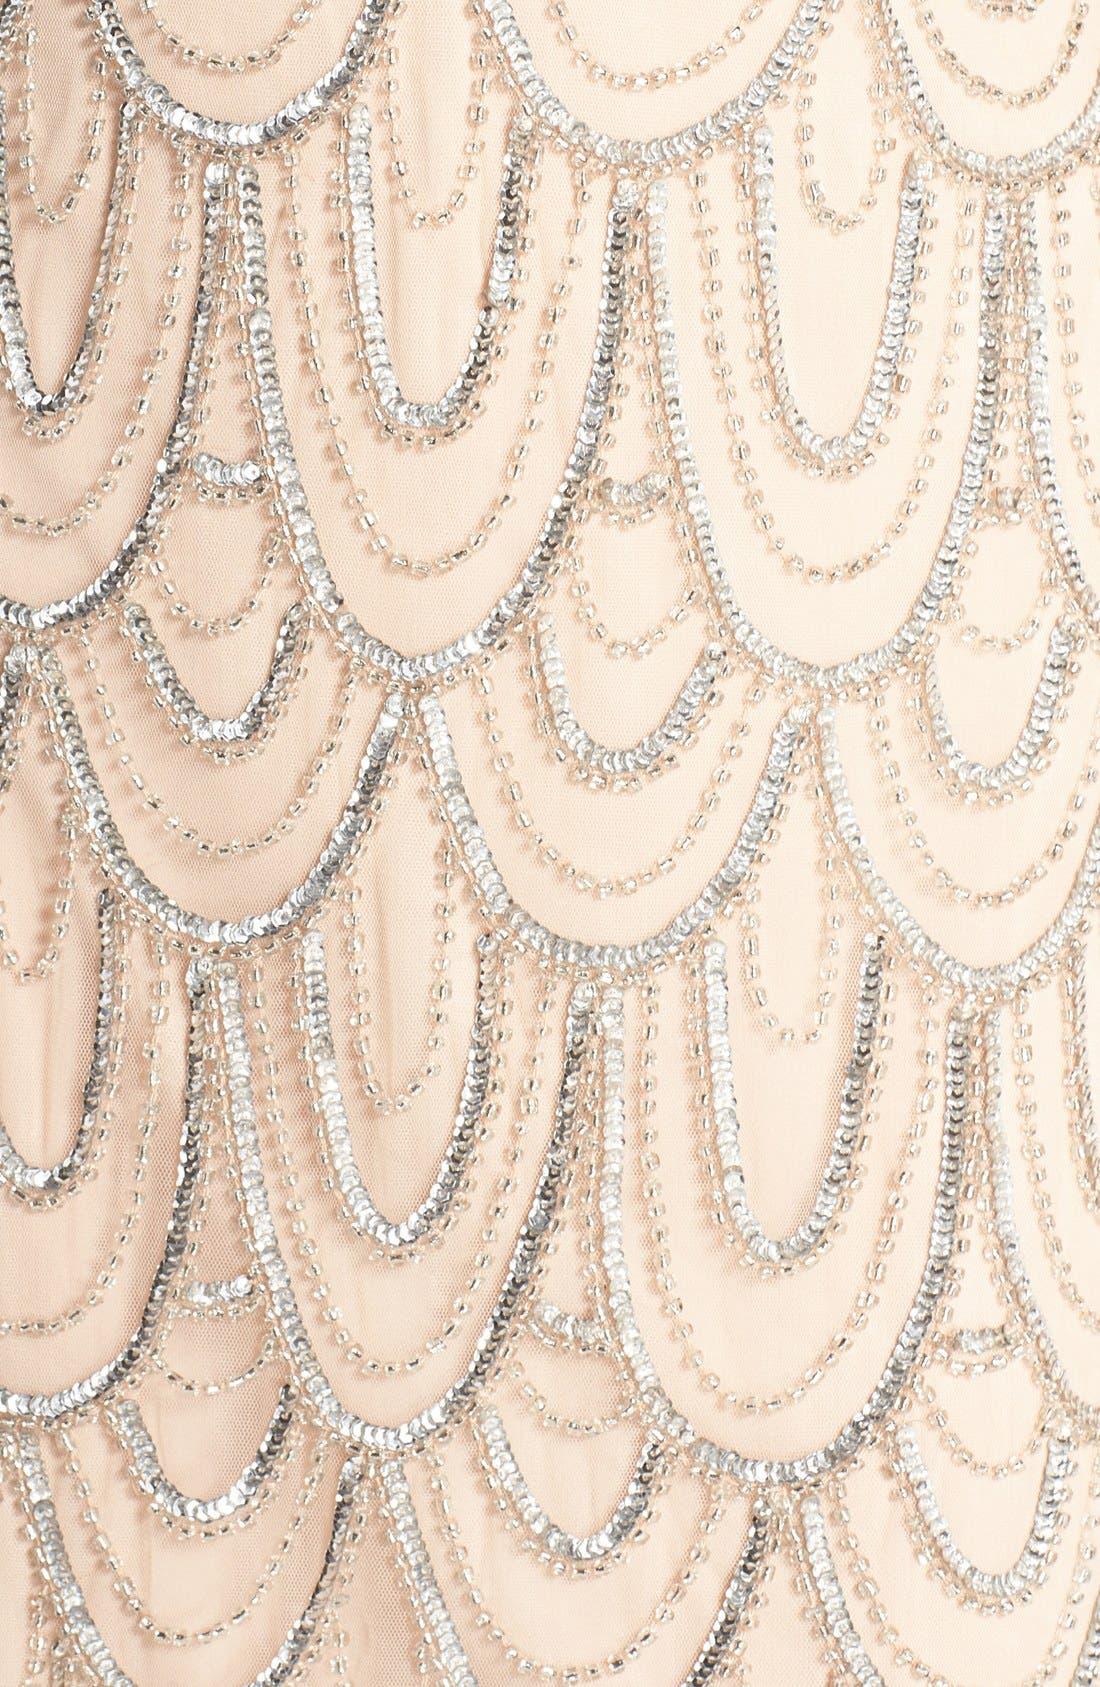 Embellished Mesh Sheath Dress,                             Alternate thumbnail 57, color,